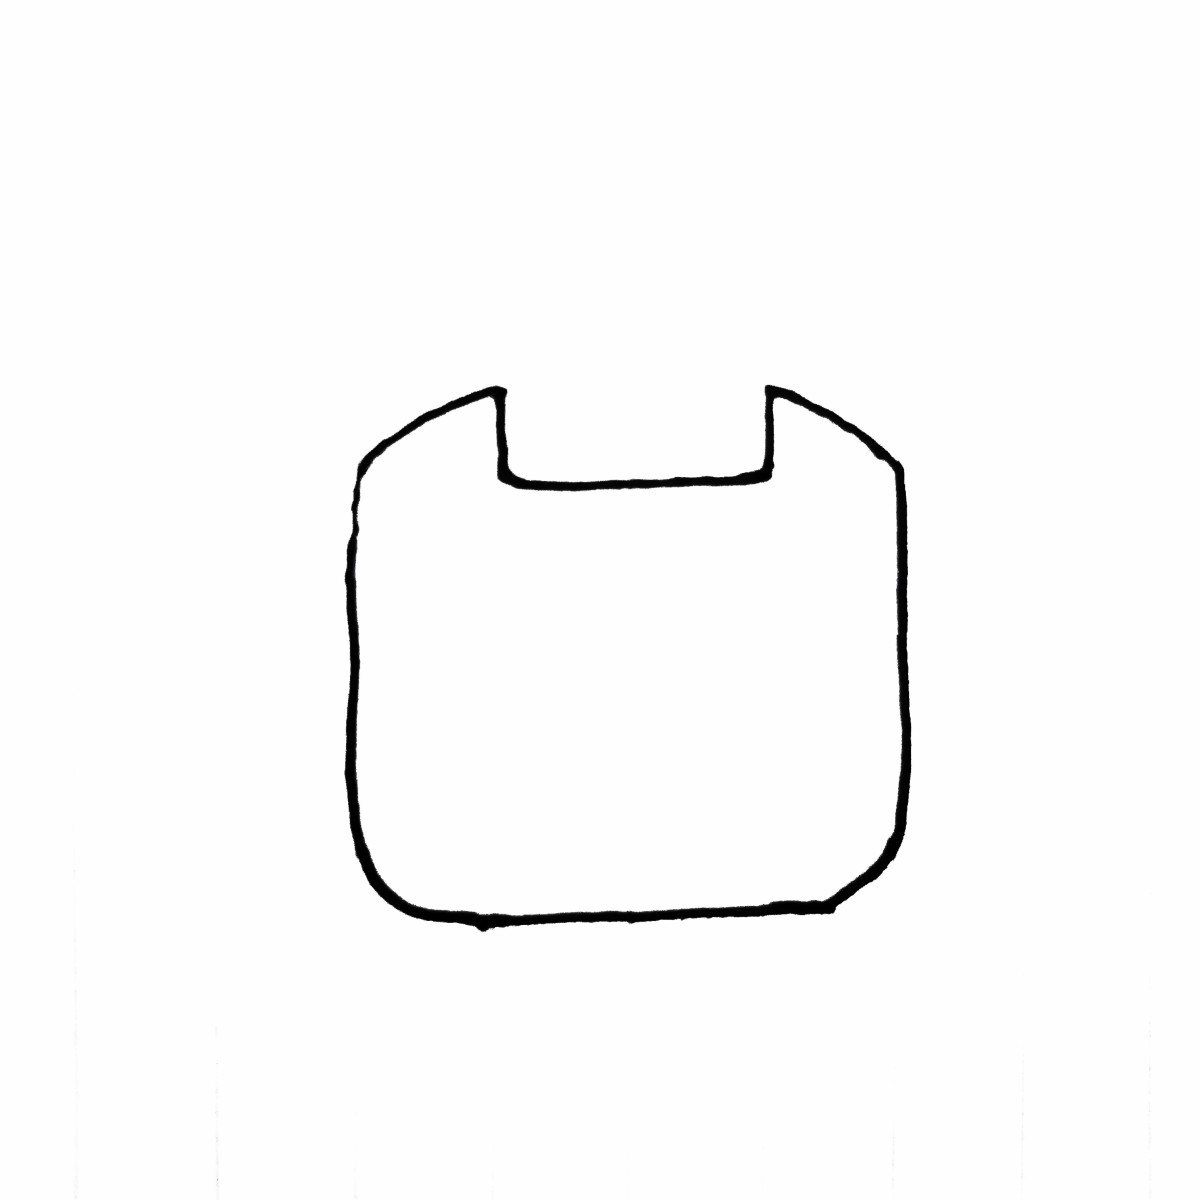 Step 1: Draw the head